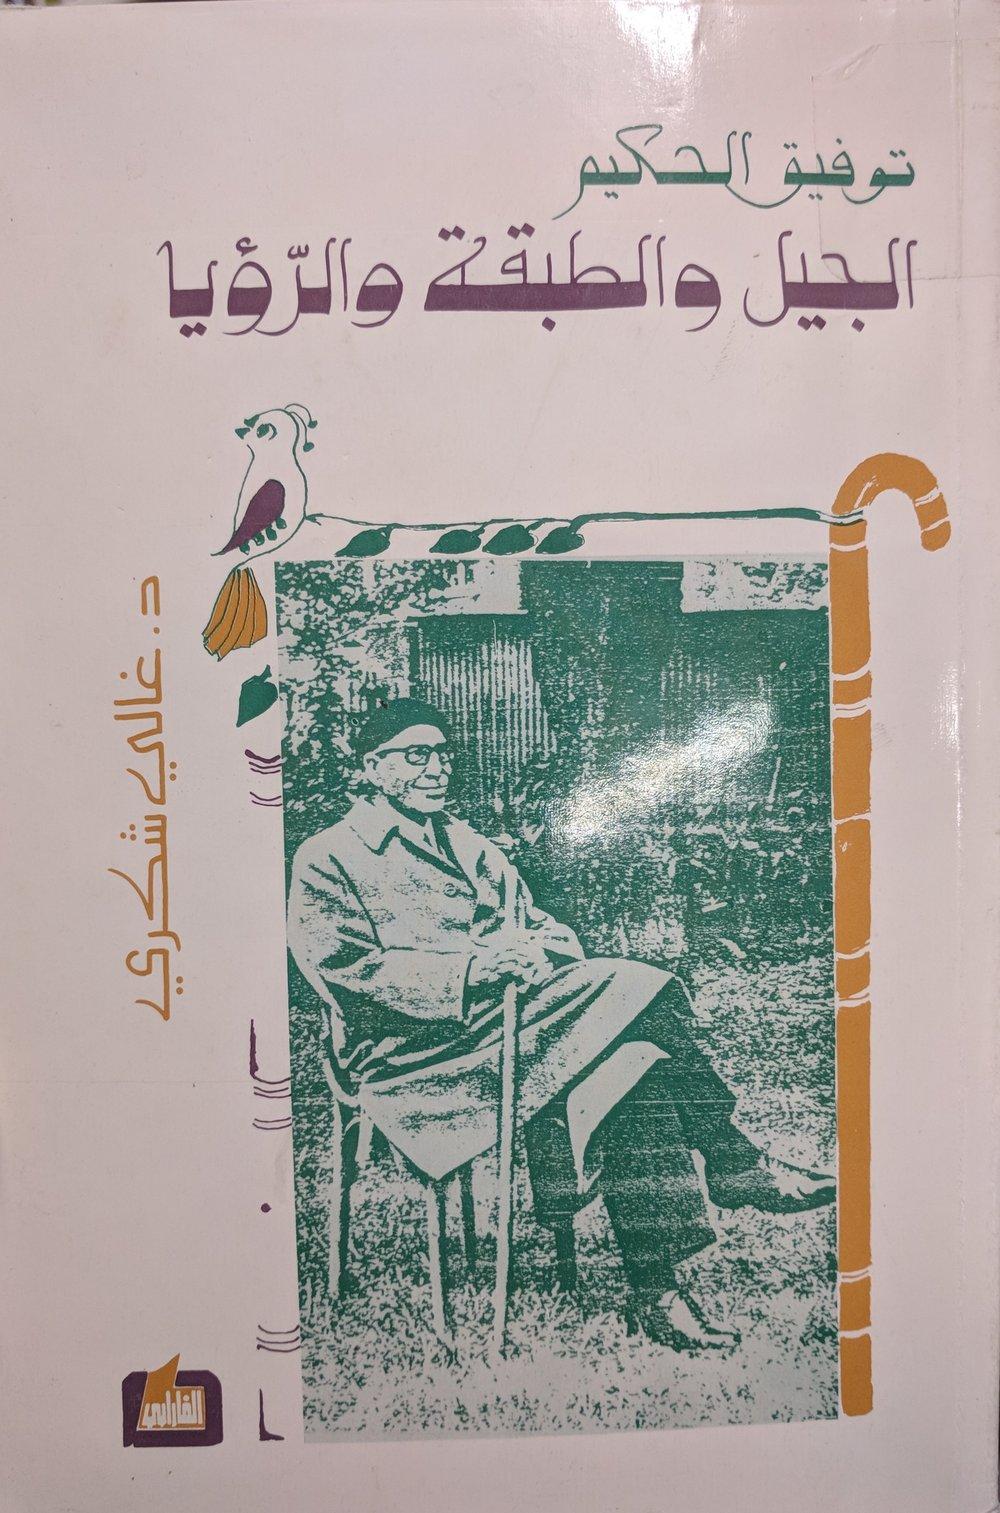 Tawfīq al-Ḥakīm: al-jīl wa-l-ṭabaqah wa-l-ru'yā   by Ghālī Shukrī (Bayrūt : Dār al-Fārābī, 1993)